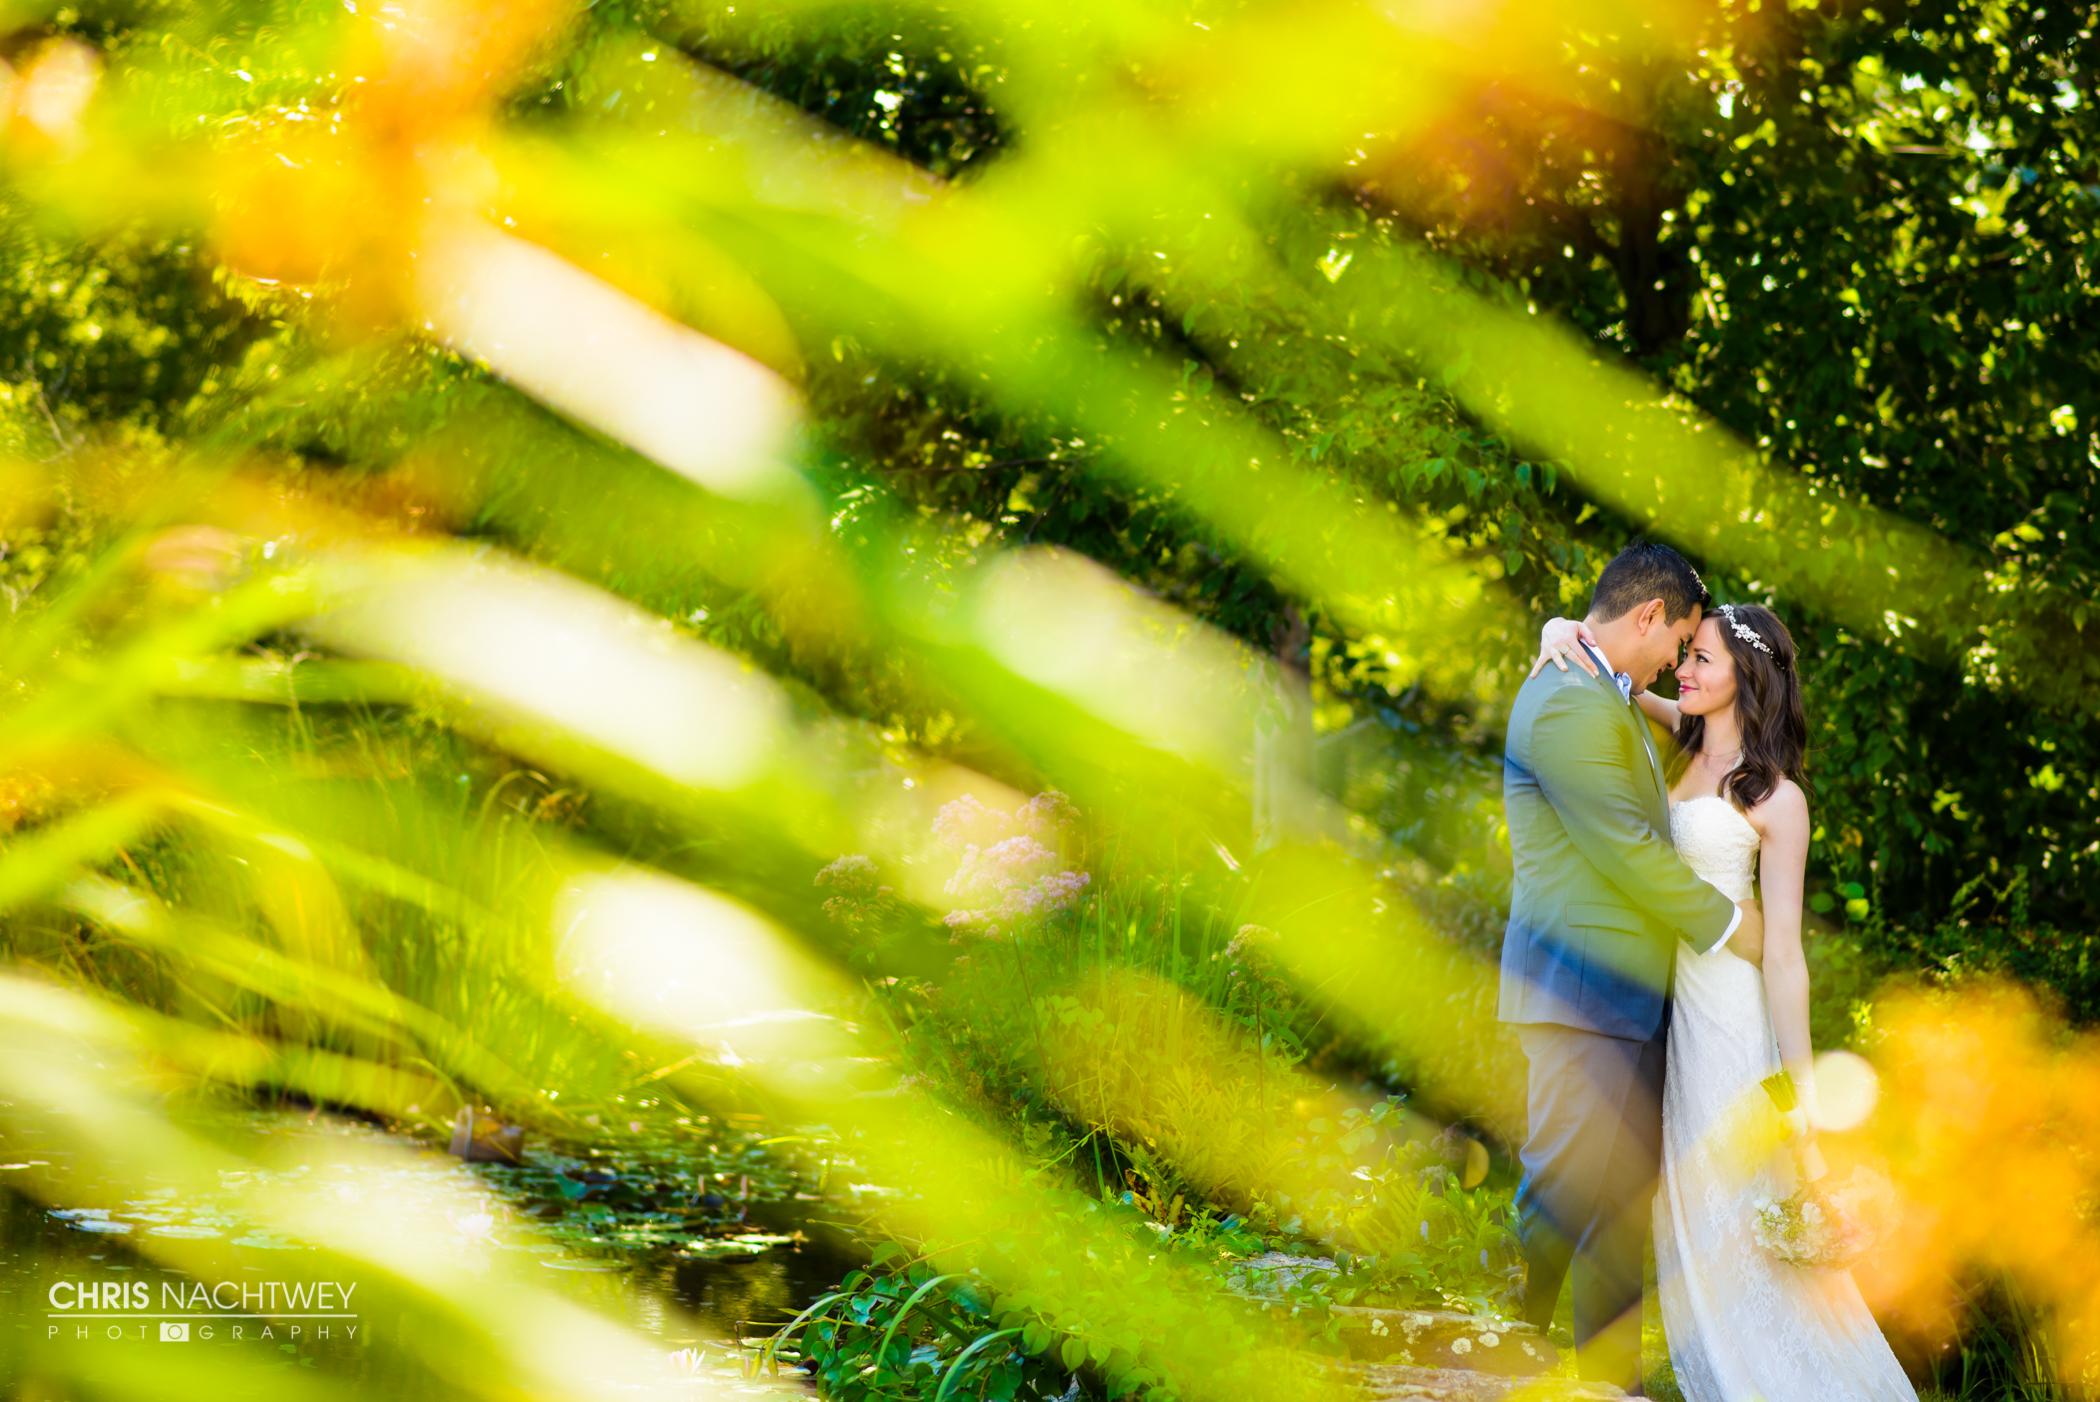 inn-at-mystic-connecticut-wedding-photographer-chris-nachtwey-17.jpg